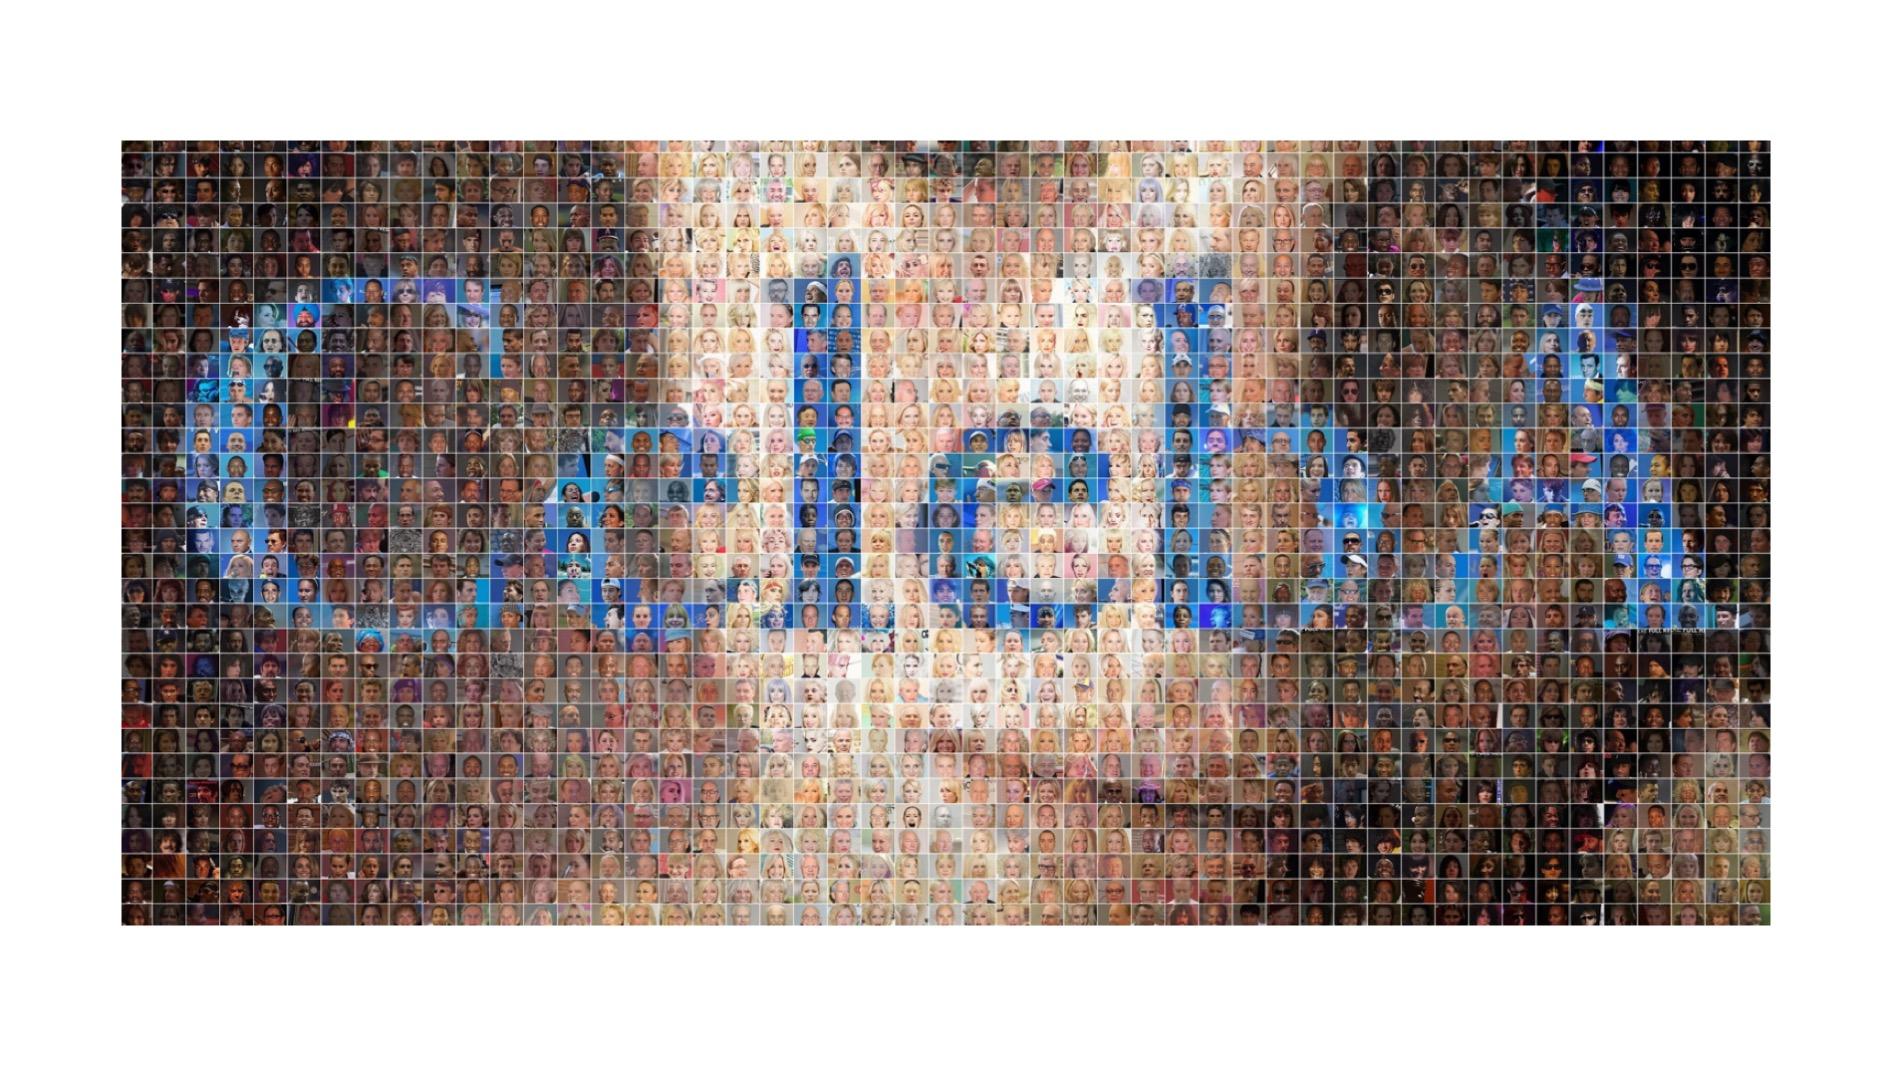 CelebFaces Attributes (CelebA) Dataset   Kaggle